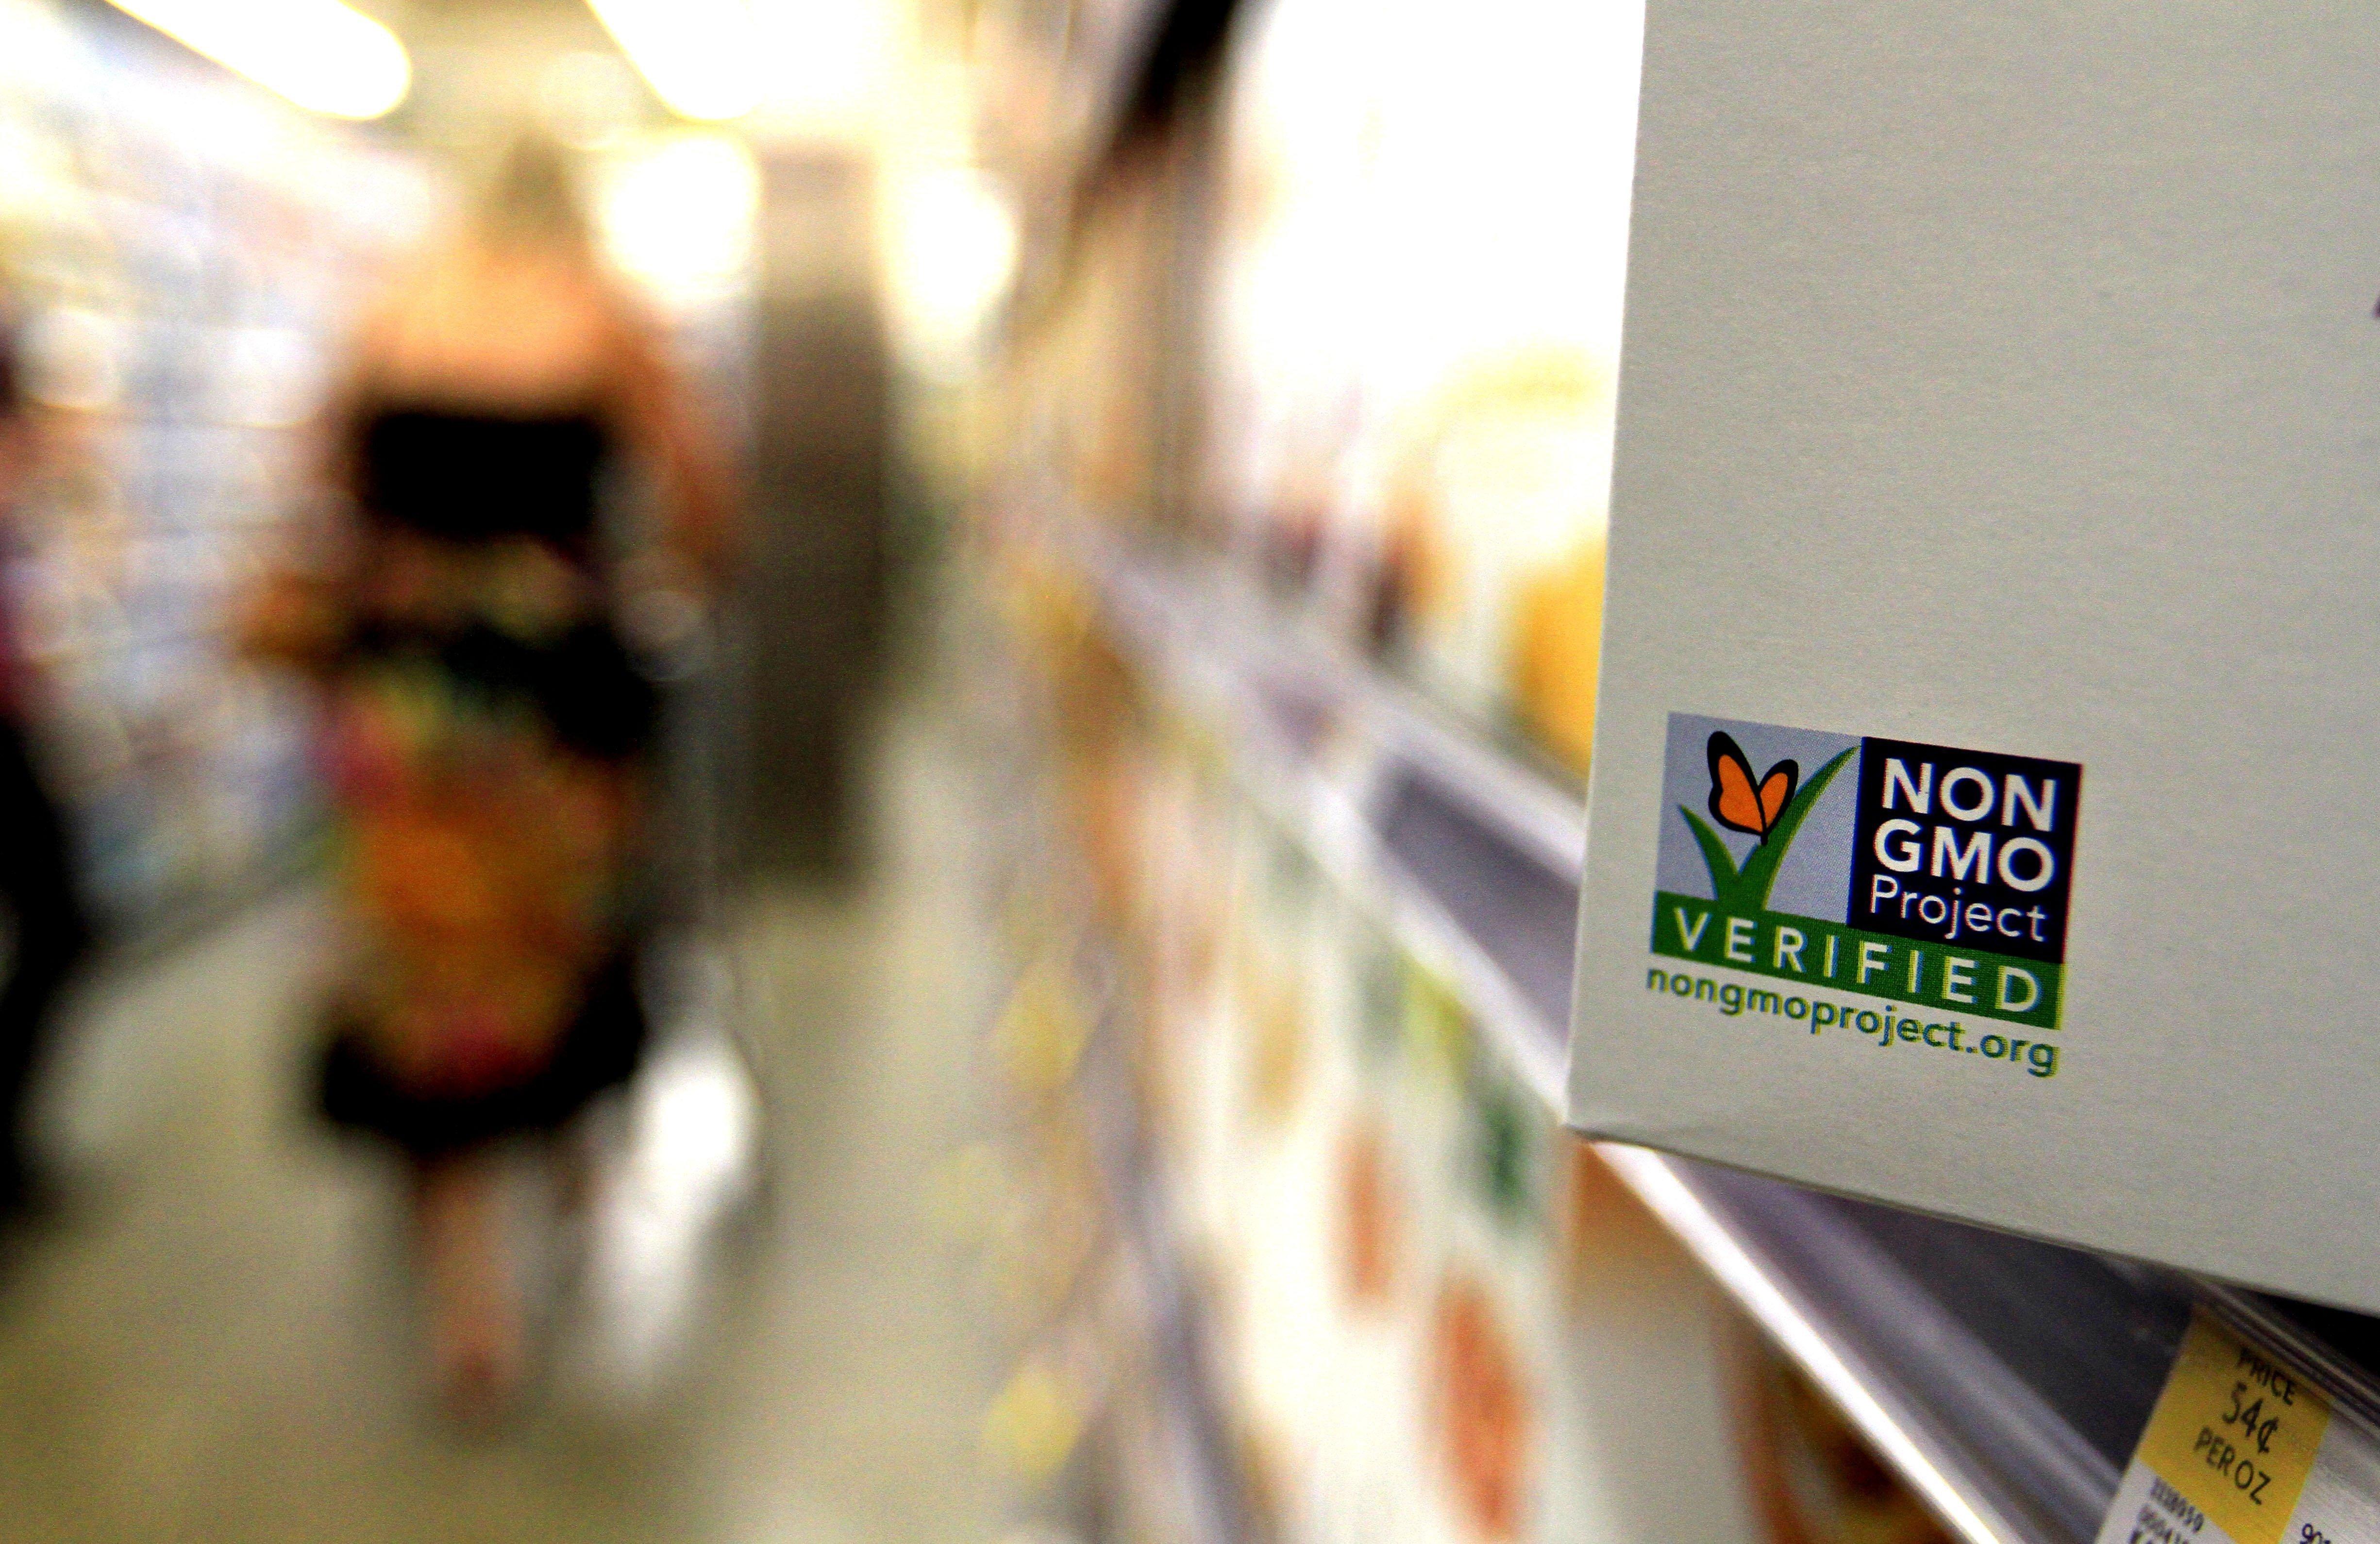 Florida mom sues over Goldfish ënaturalí label